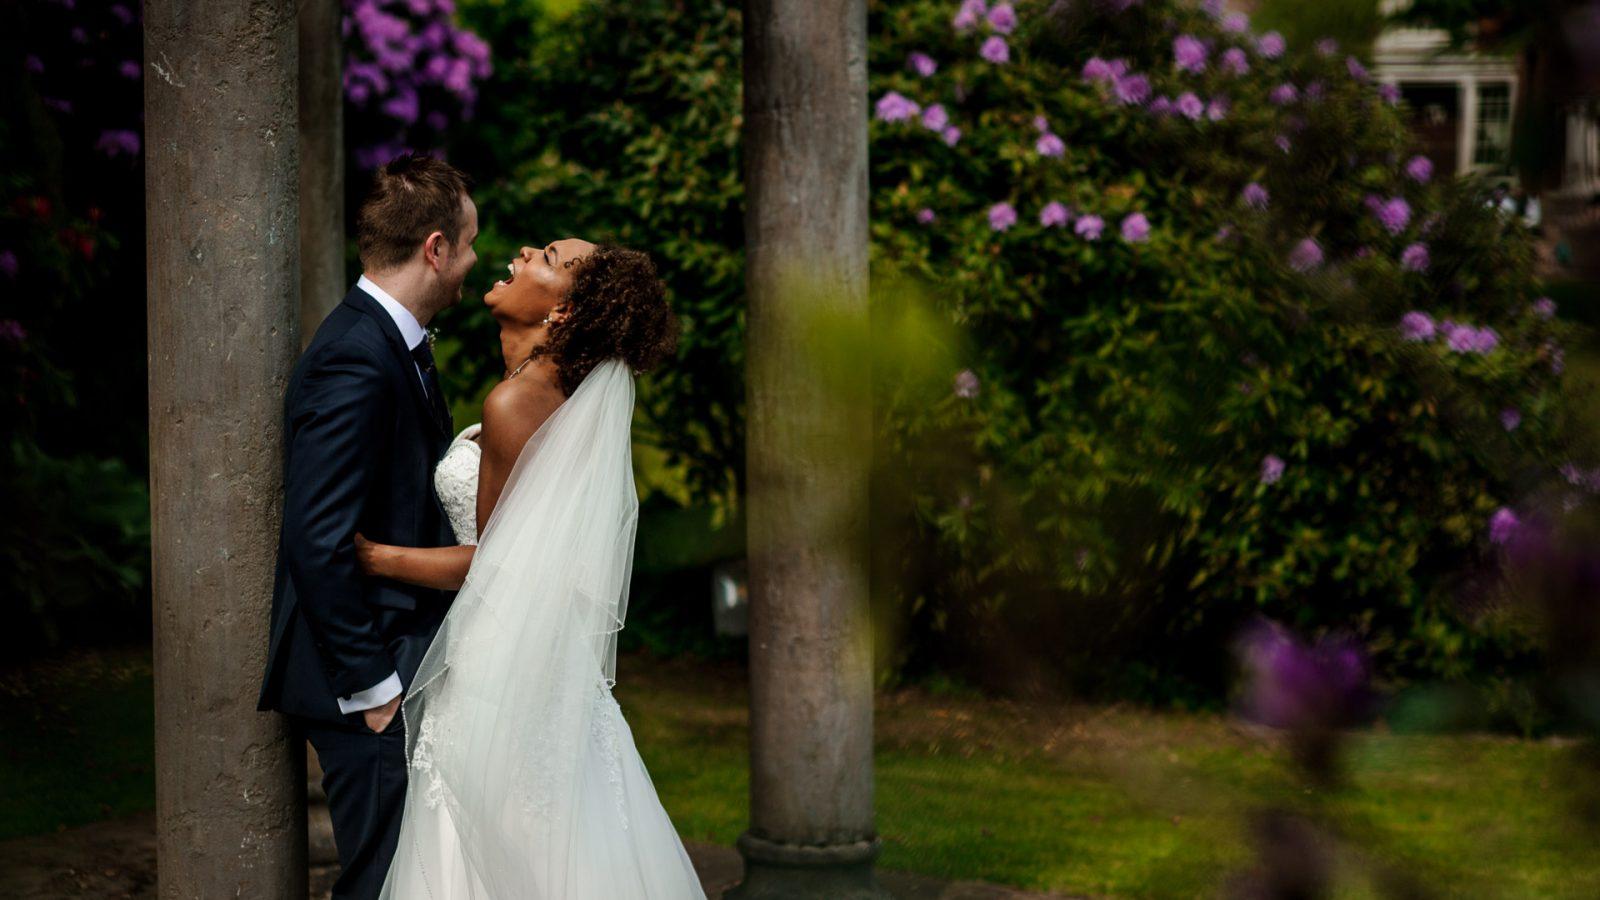 best-wedding-photos-2017-kimberley-and-joseph-laughing-natural-shot